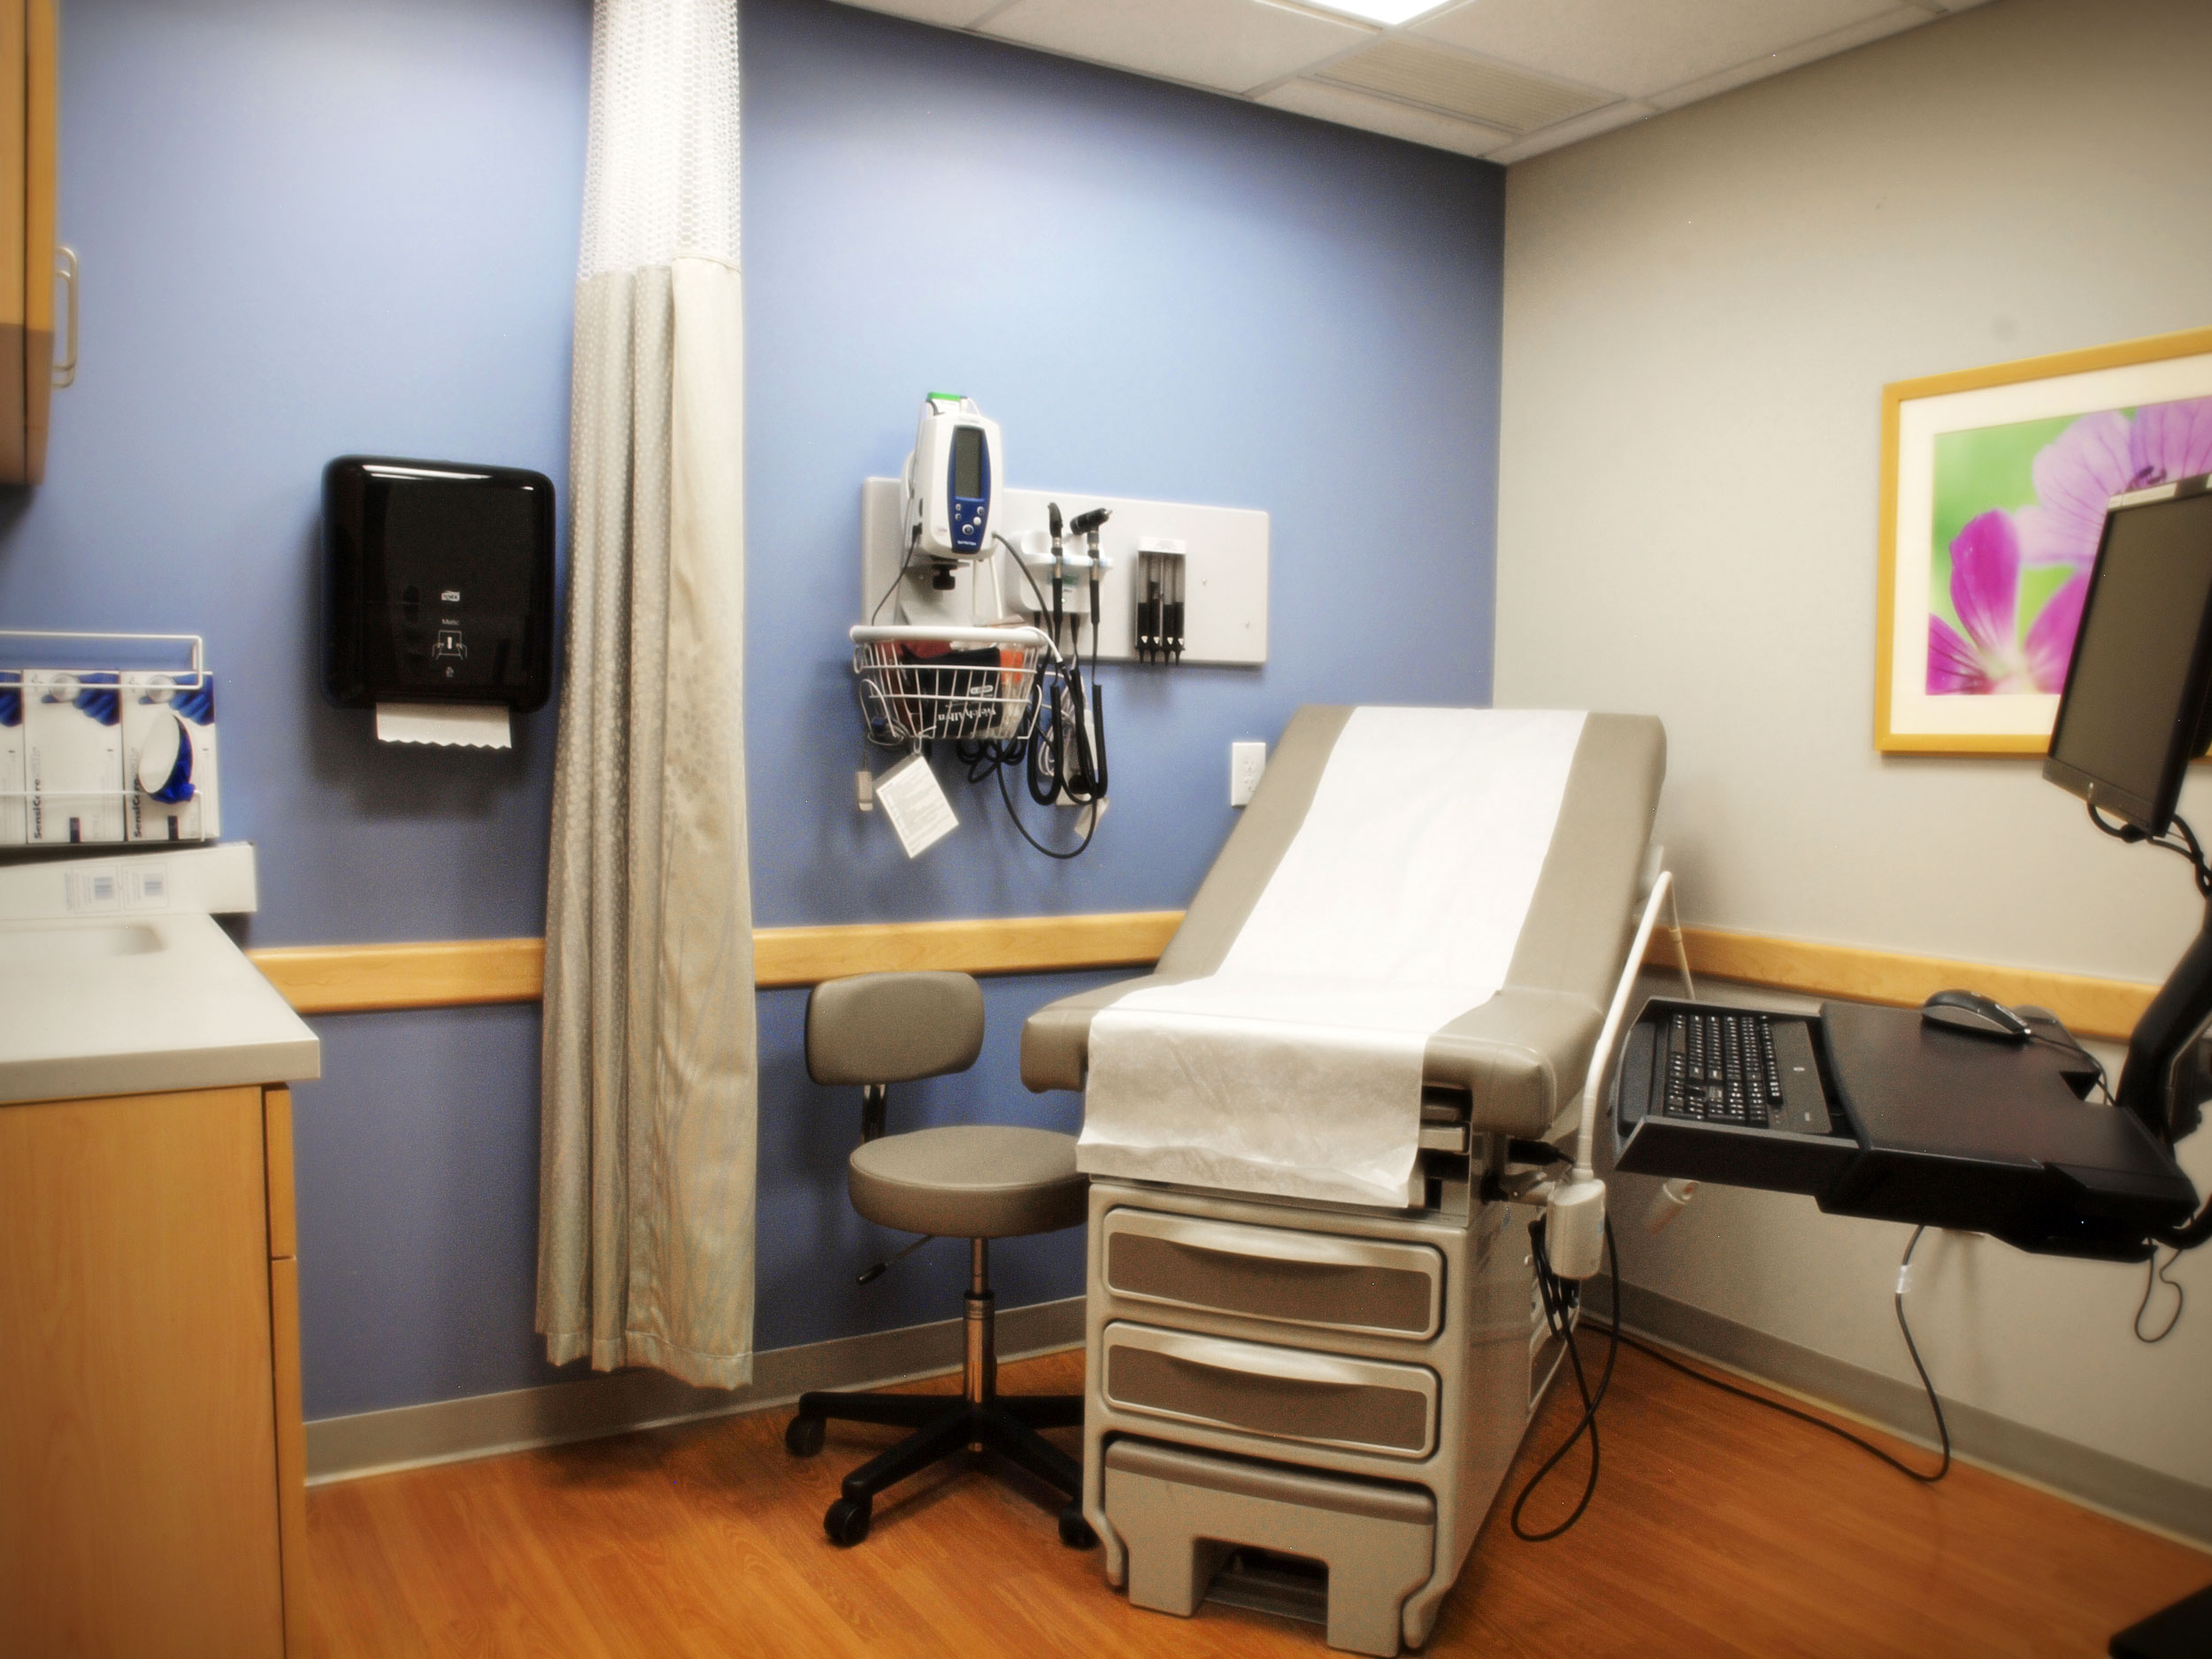 Montefiore Health System - Via Verde - 03